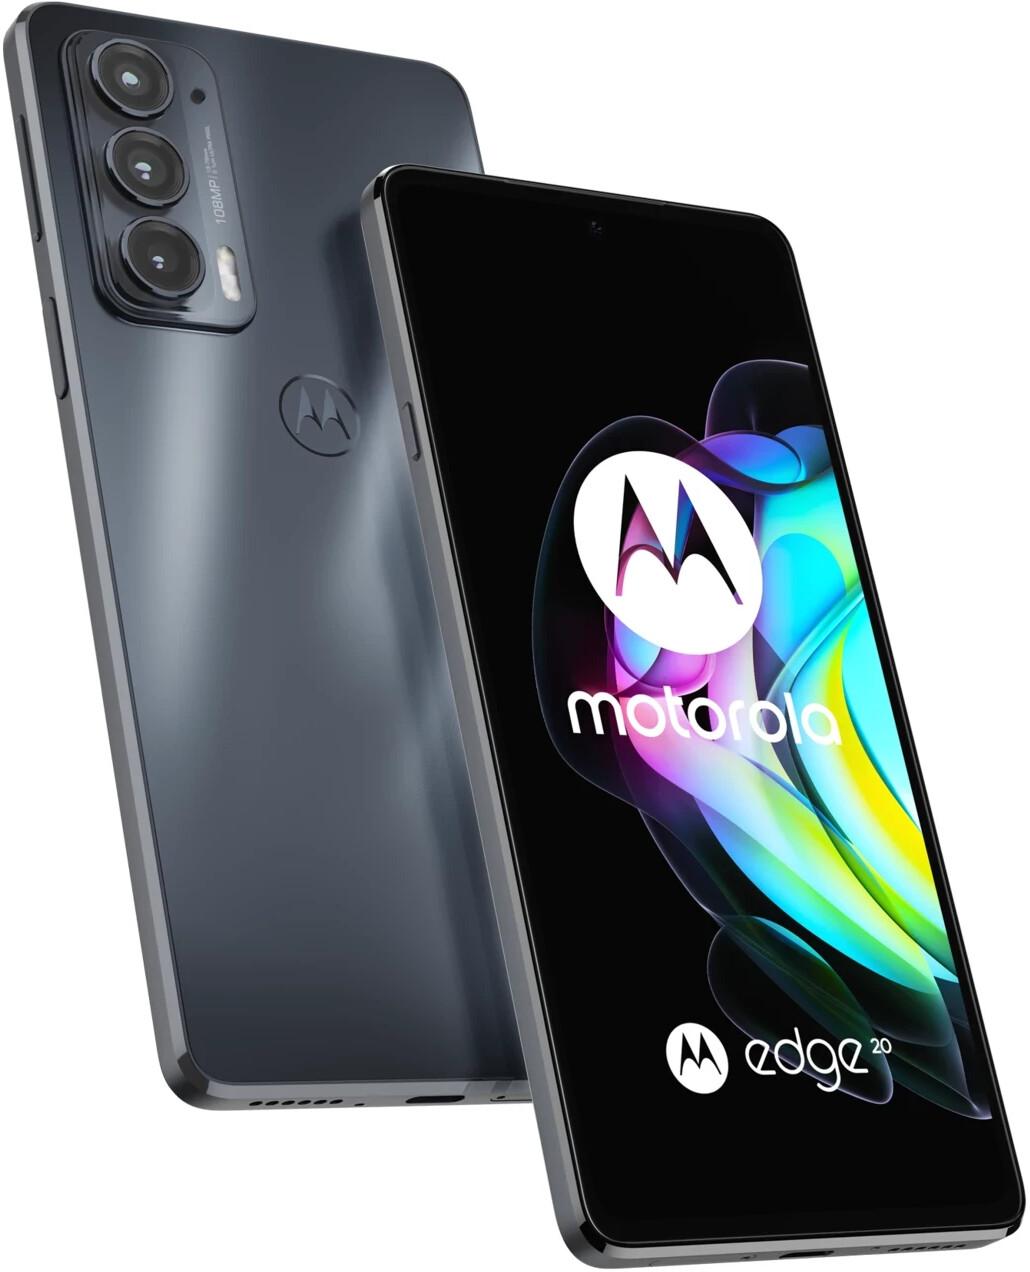 Image of Motorola Edge 20 128GB Frosted GreyOfferta a tempo limitato - Affrettati